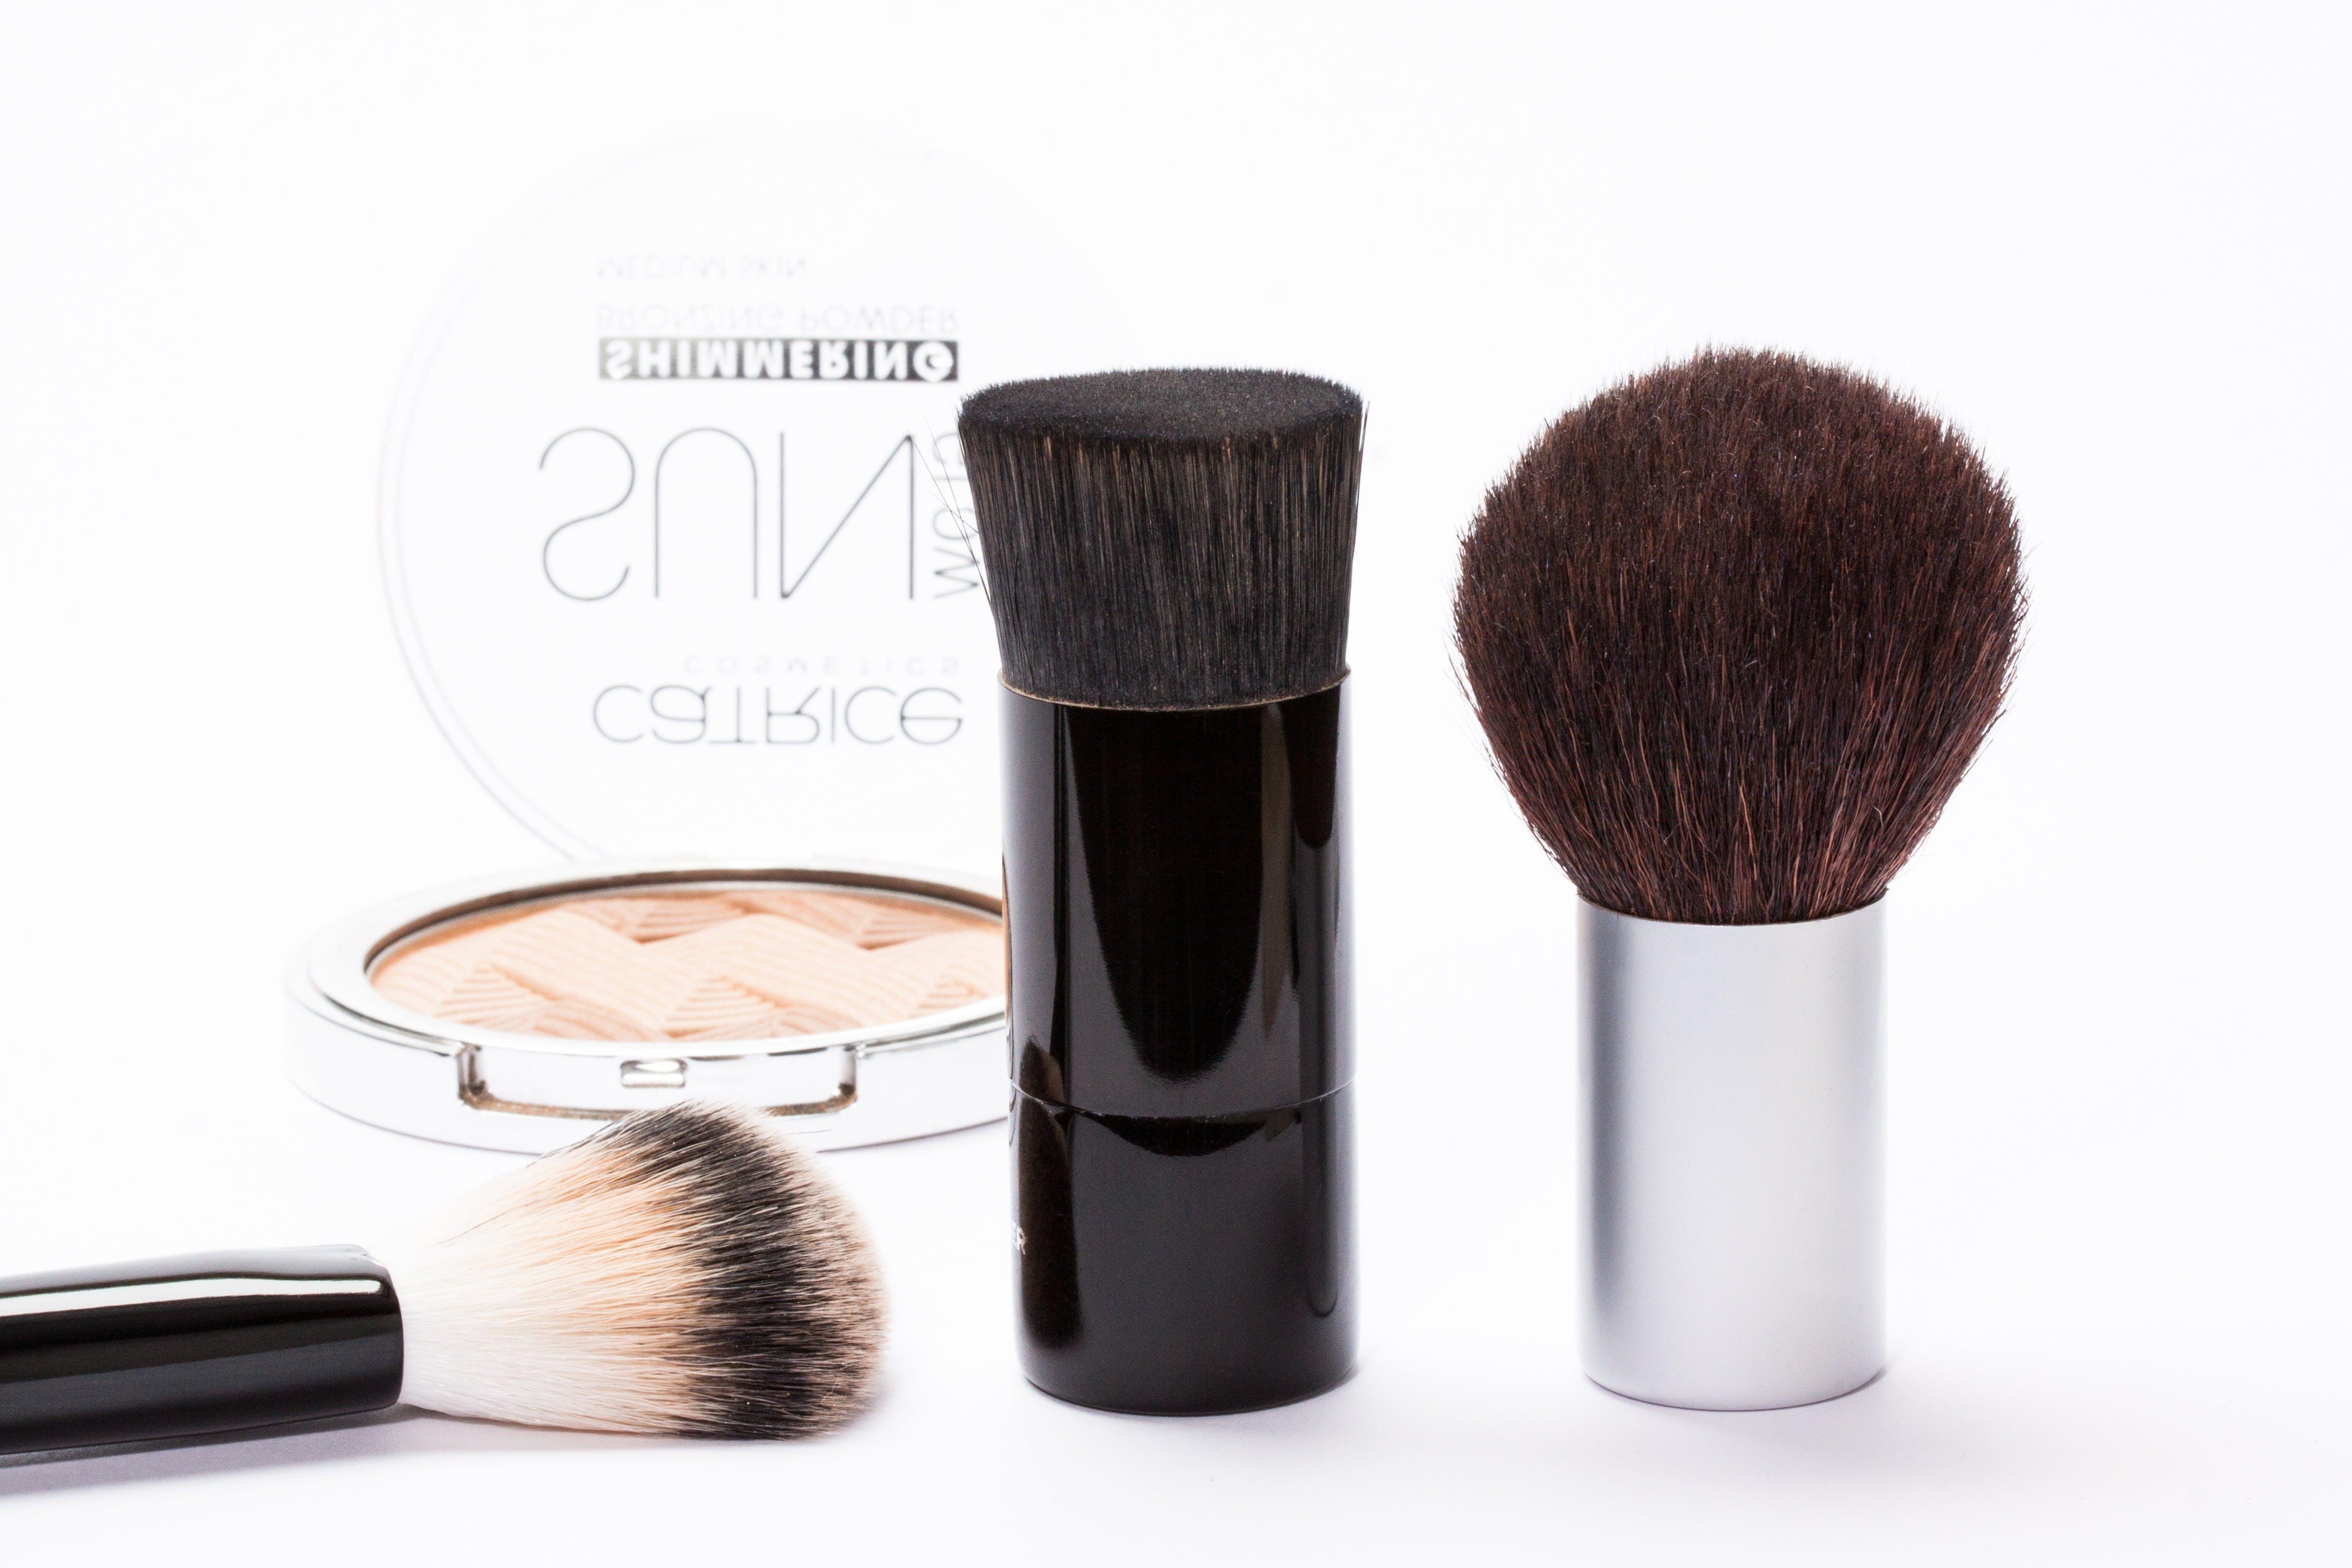 Kostenloses Stock Foto zu kosmetika, makeup, makeup bürsten